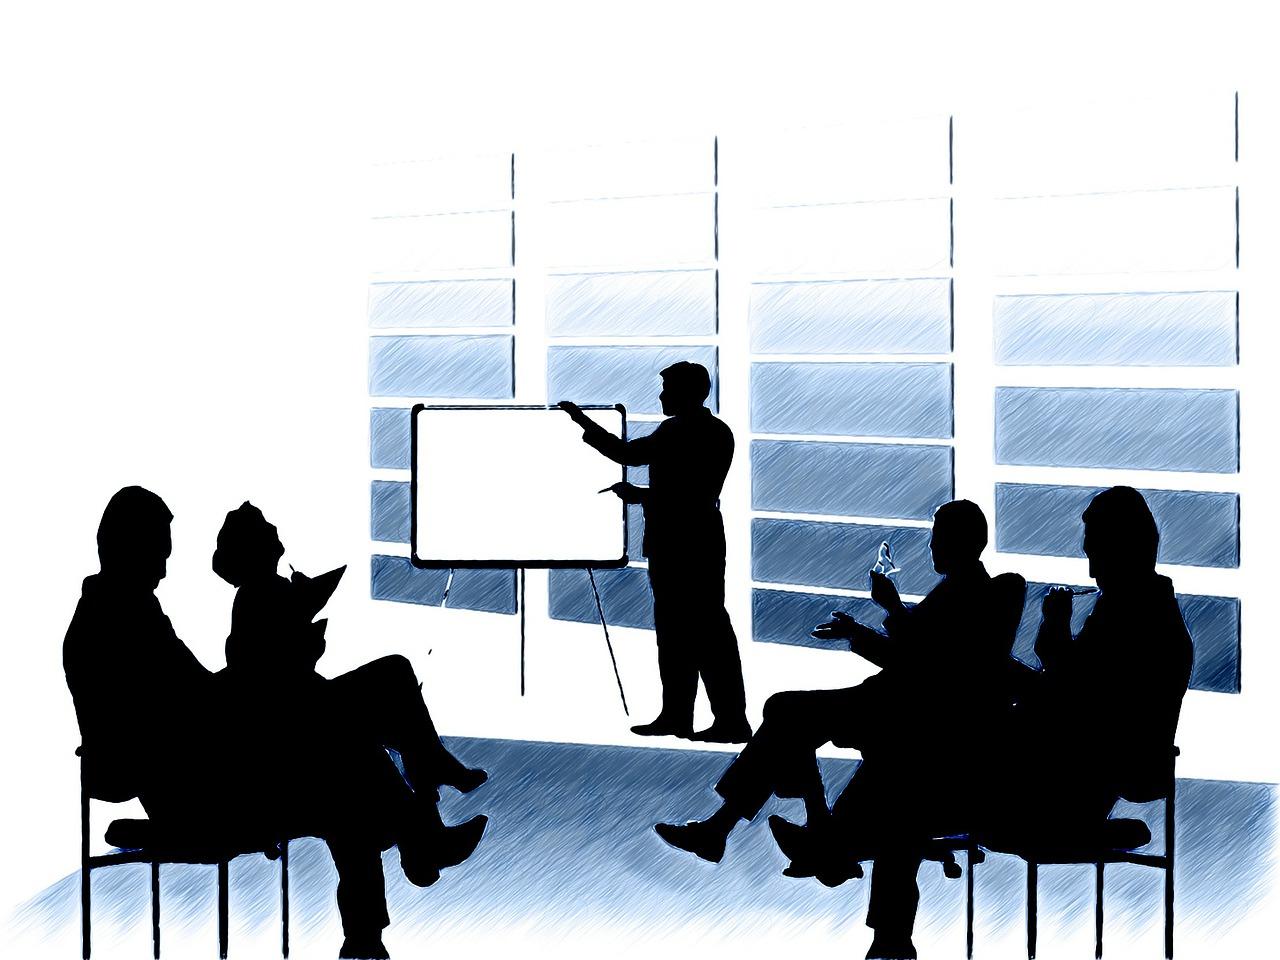 ATG Conferences, Meetings & Webinars 4/22/19